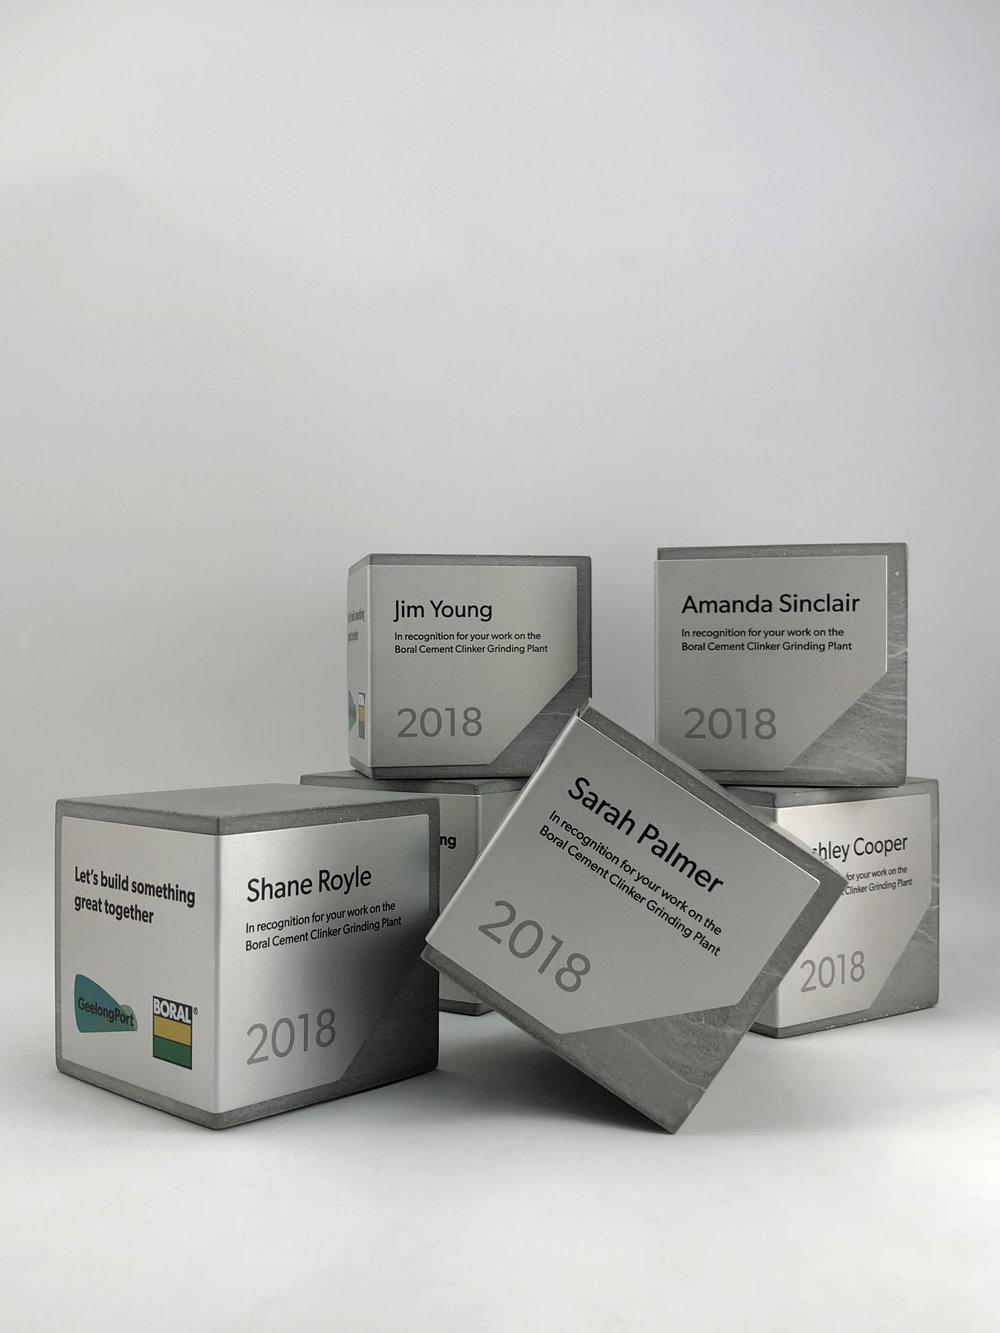 geelong-port-cement-cube-awards-trophy-06.jpg